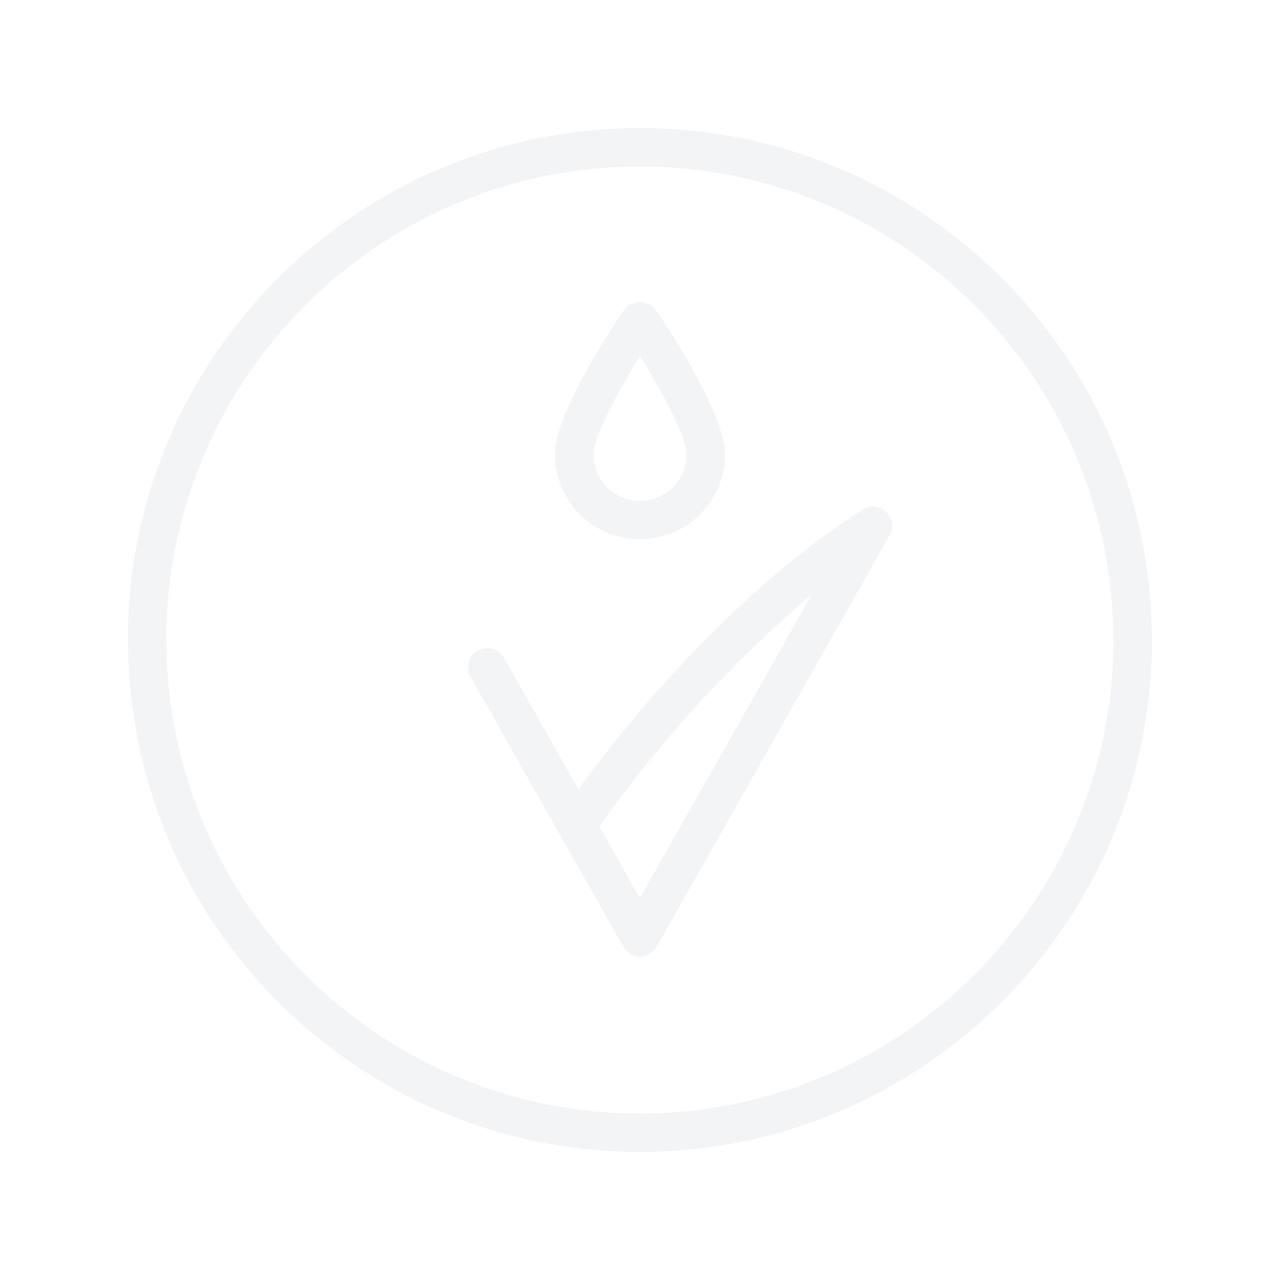 HOLIKA HOLIKA Prime Youth Black Snail Repair гидрогелевая маска 25g